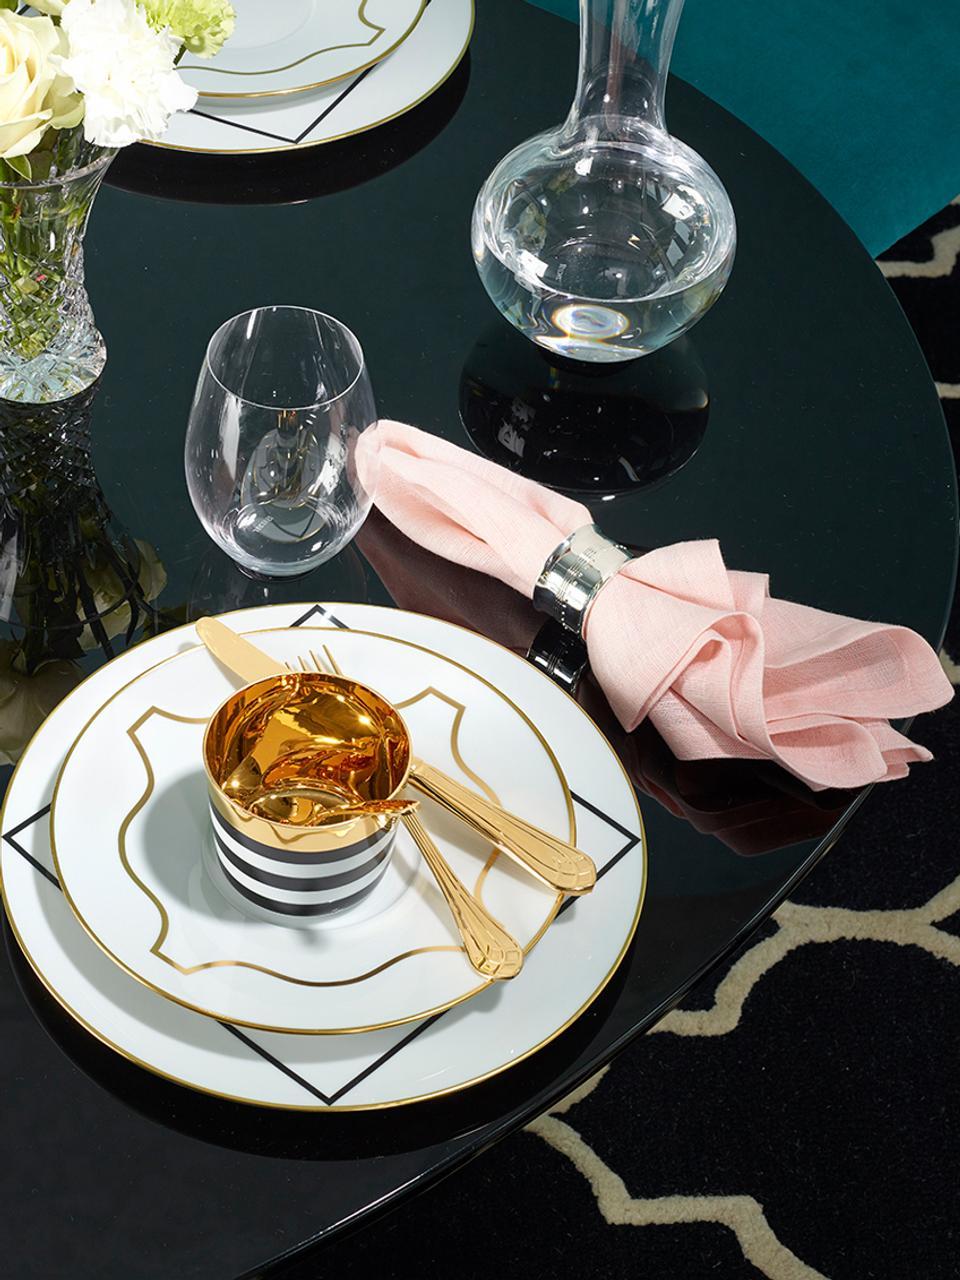 Vergoldeter Champagnerbecher Sip of Gold aus Porzellan, Rand: Vergoldet, Schwarz, Weiß, Gold, 300 ml